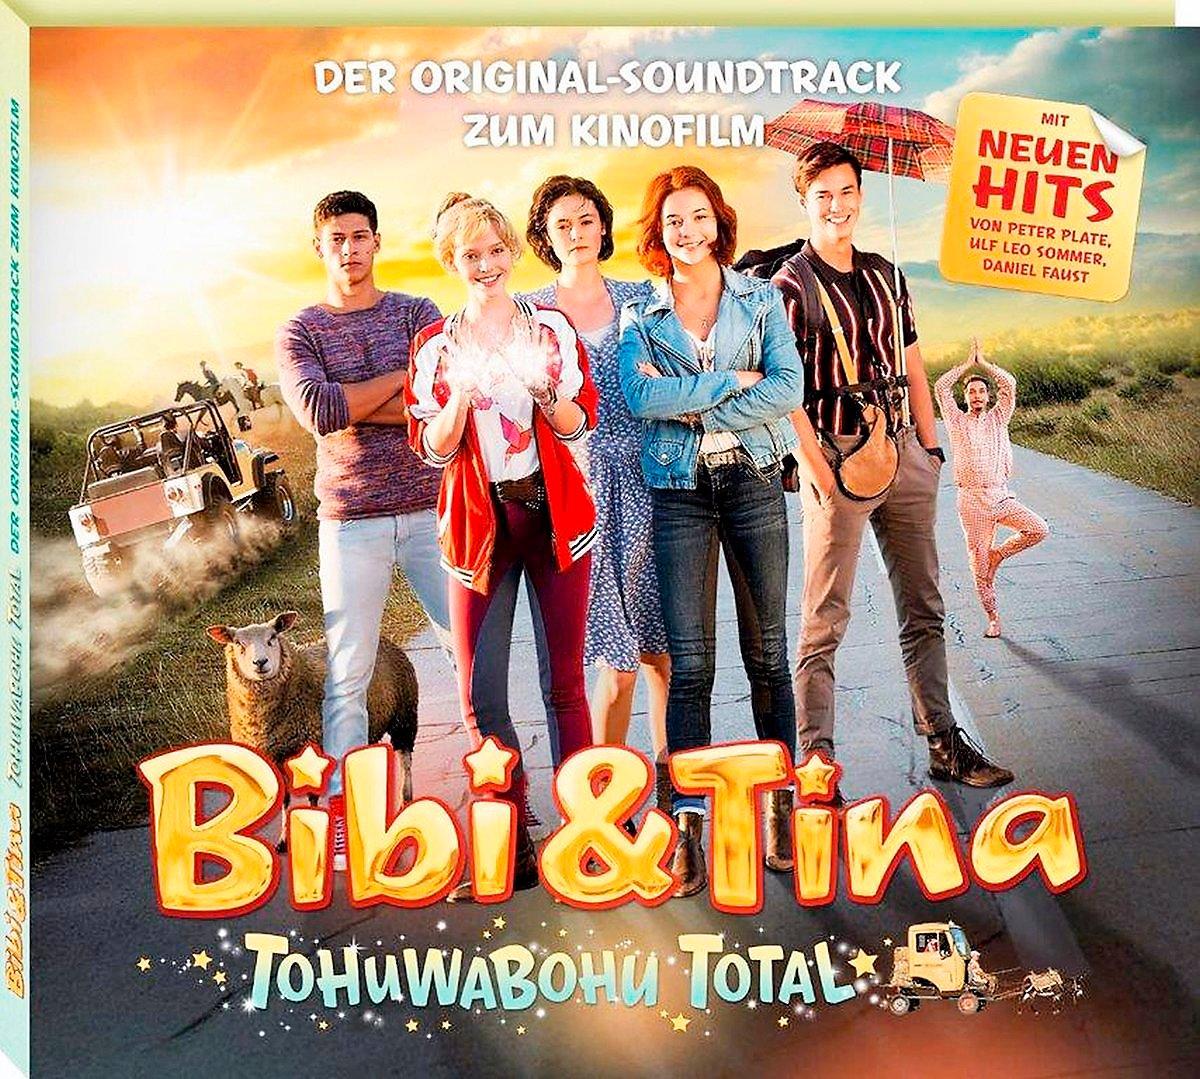 Bibi & Tina - Tohuwabohu Total Der Original-Soundtrack zum Kinofilm ...